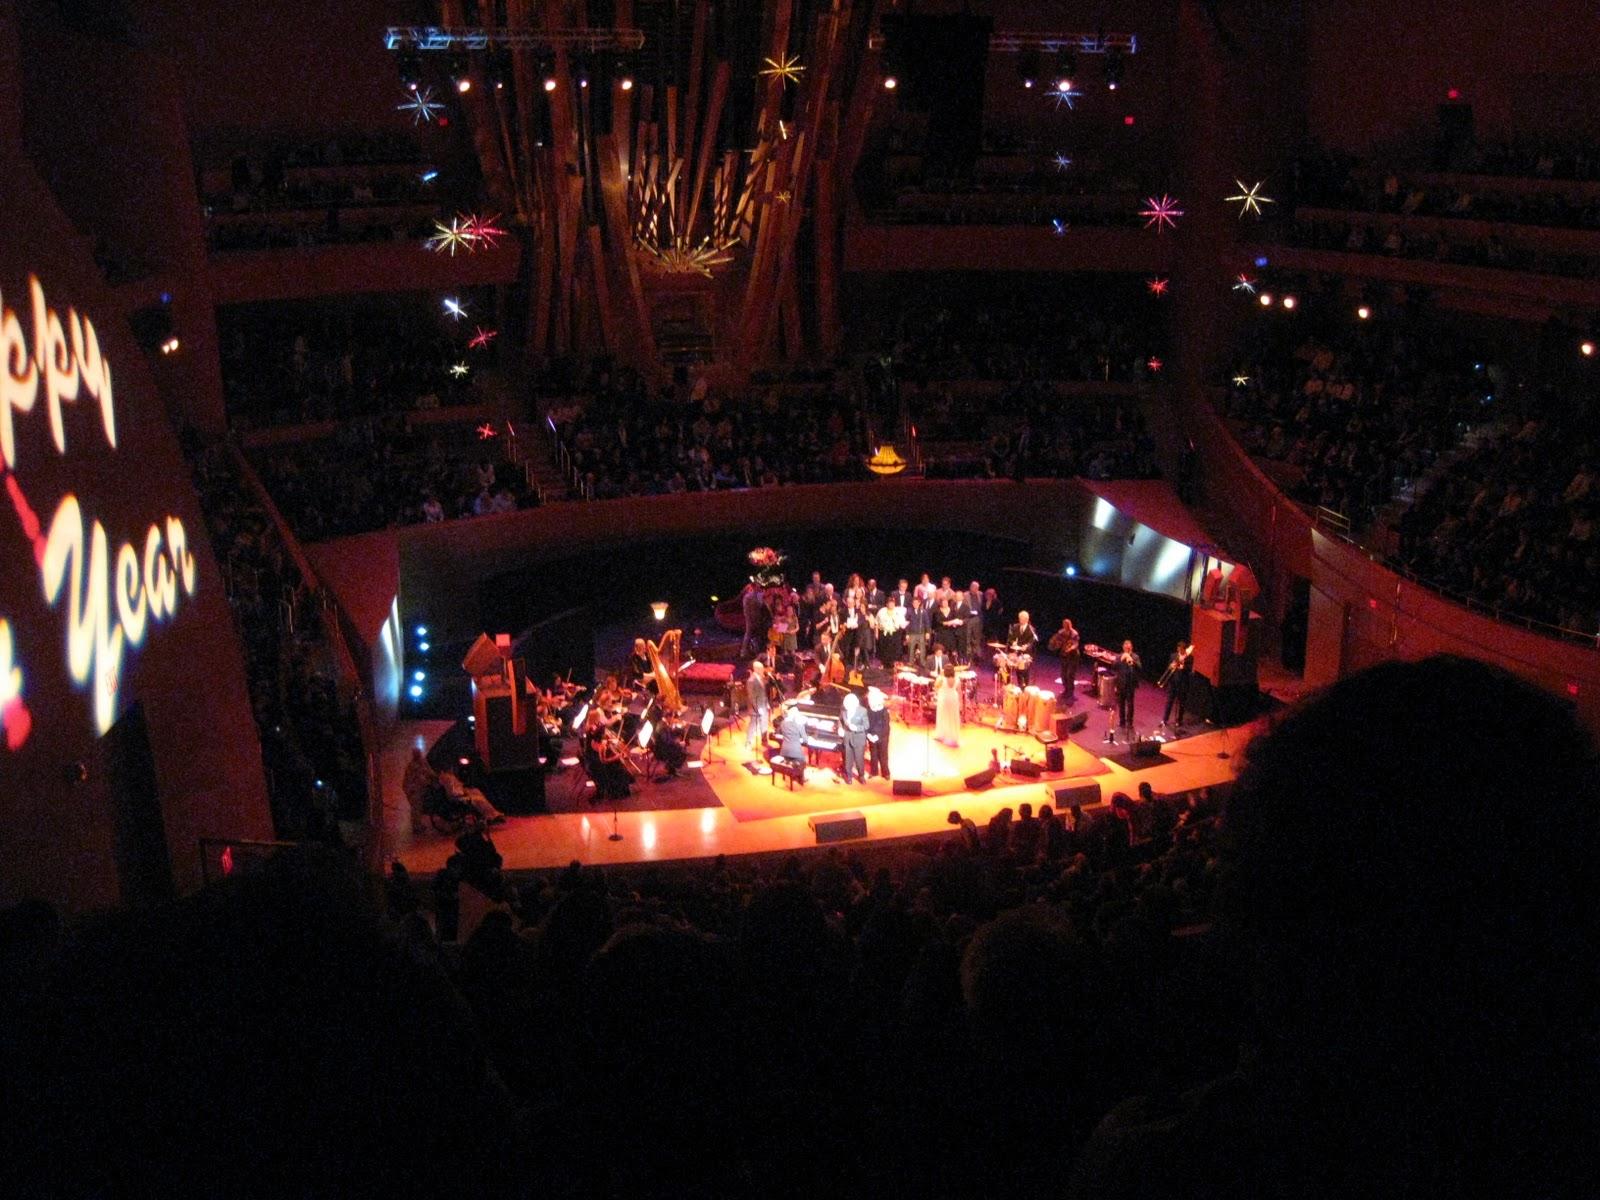 http://4.bp.blogspot.com/_Qn90qvGVEGM/TN4V27zx2SI/AAAAAAAAGak/7PJtYUMWMPs/s1600/Pink+Martini+at+the+Walt+Disney+Concert+Hall+%252810%2529.JPG